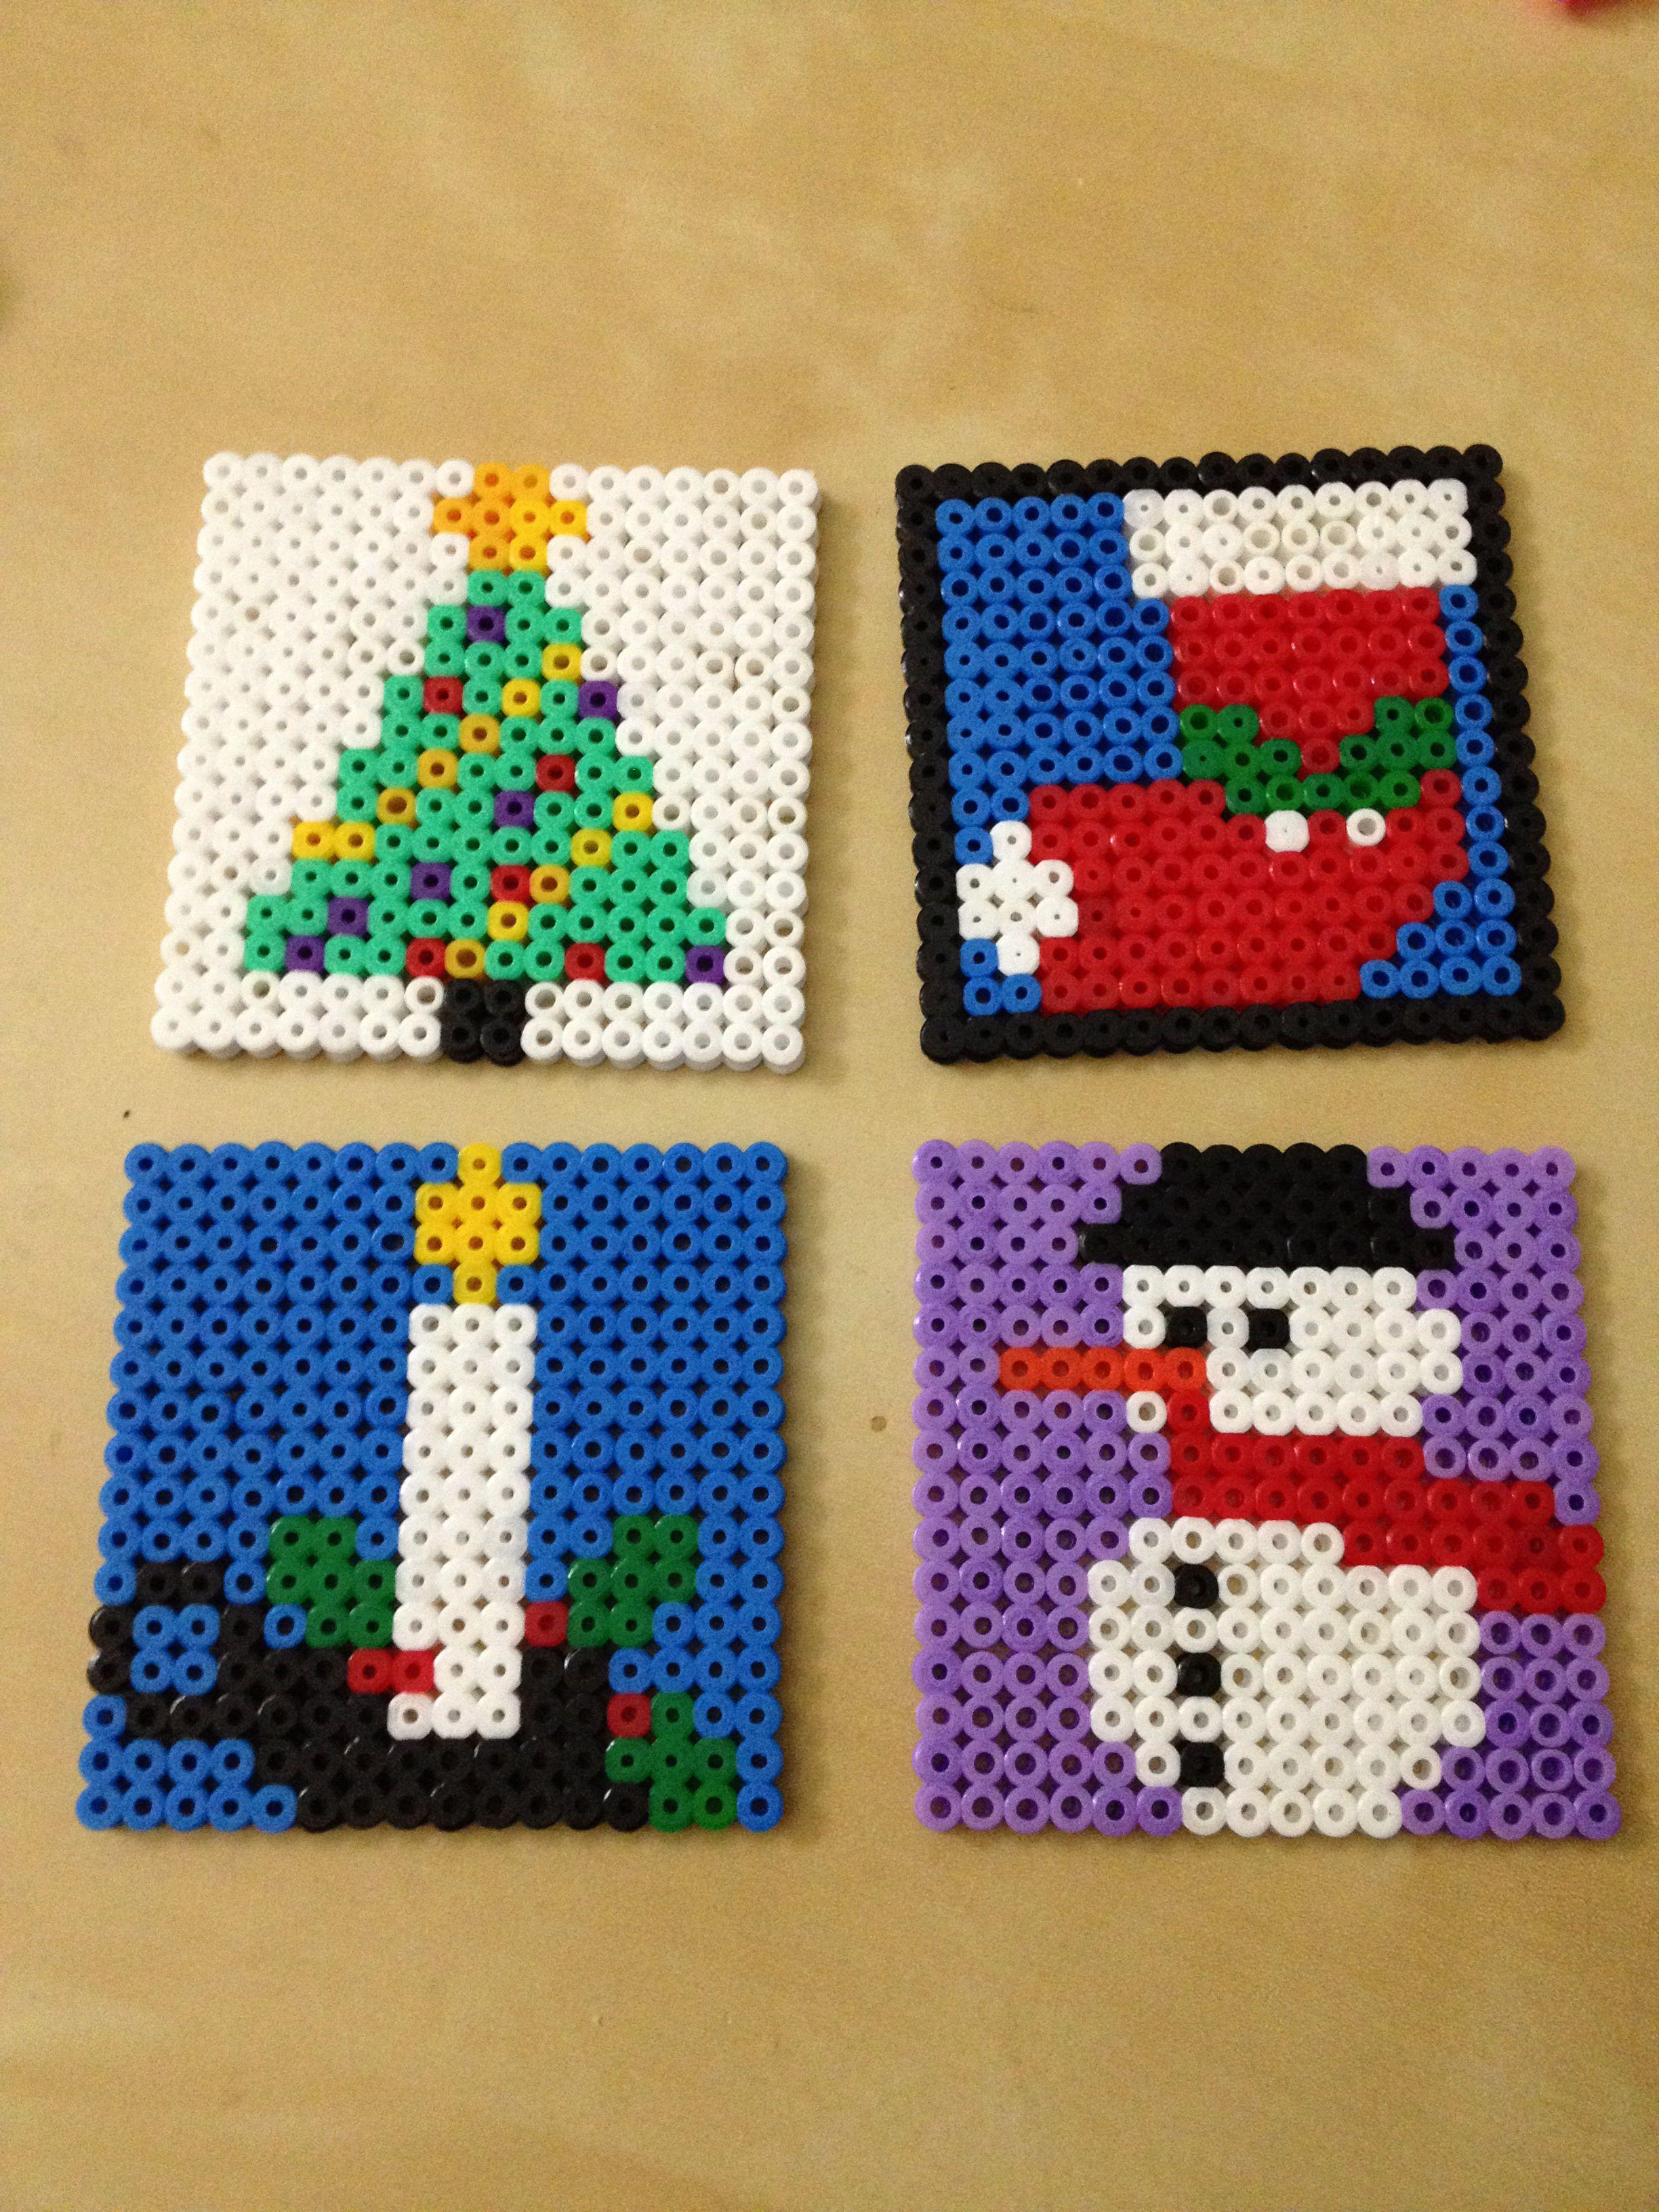 Christmas Hama Beads.Christmas Coasters Hama Beads By Irema Diadema Melt Beads